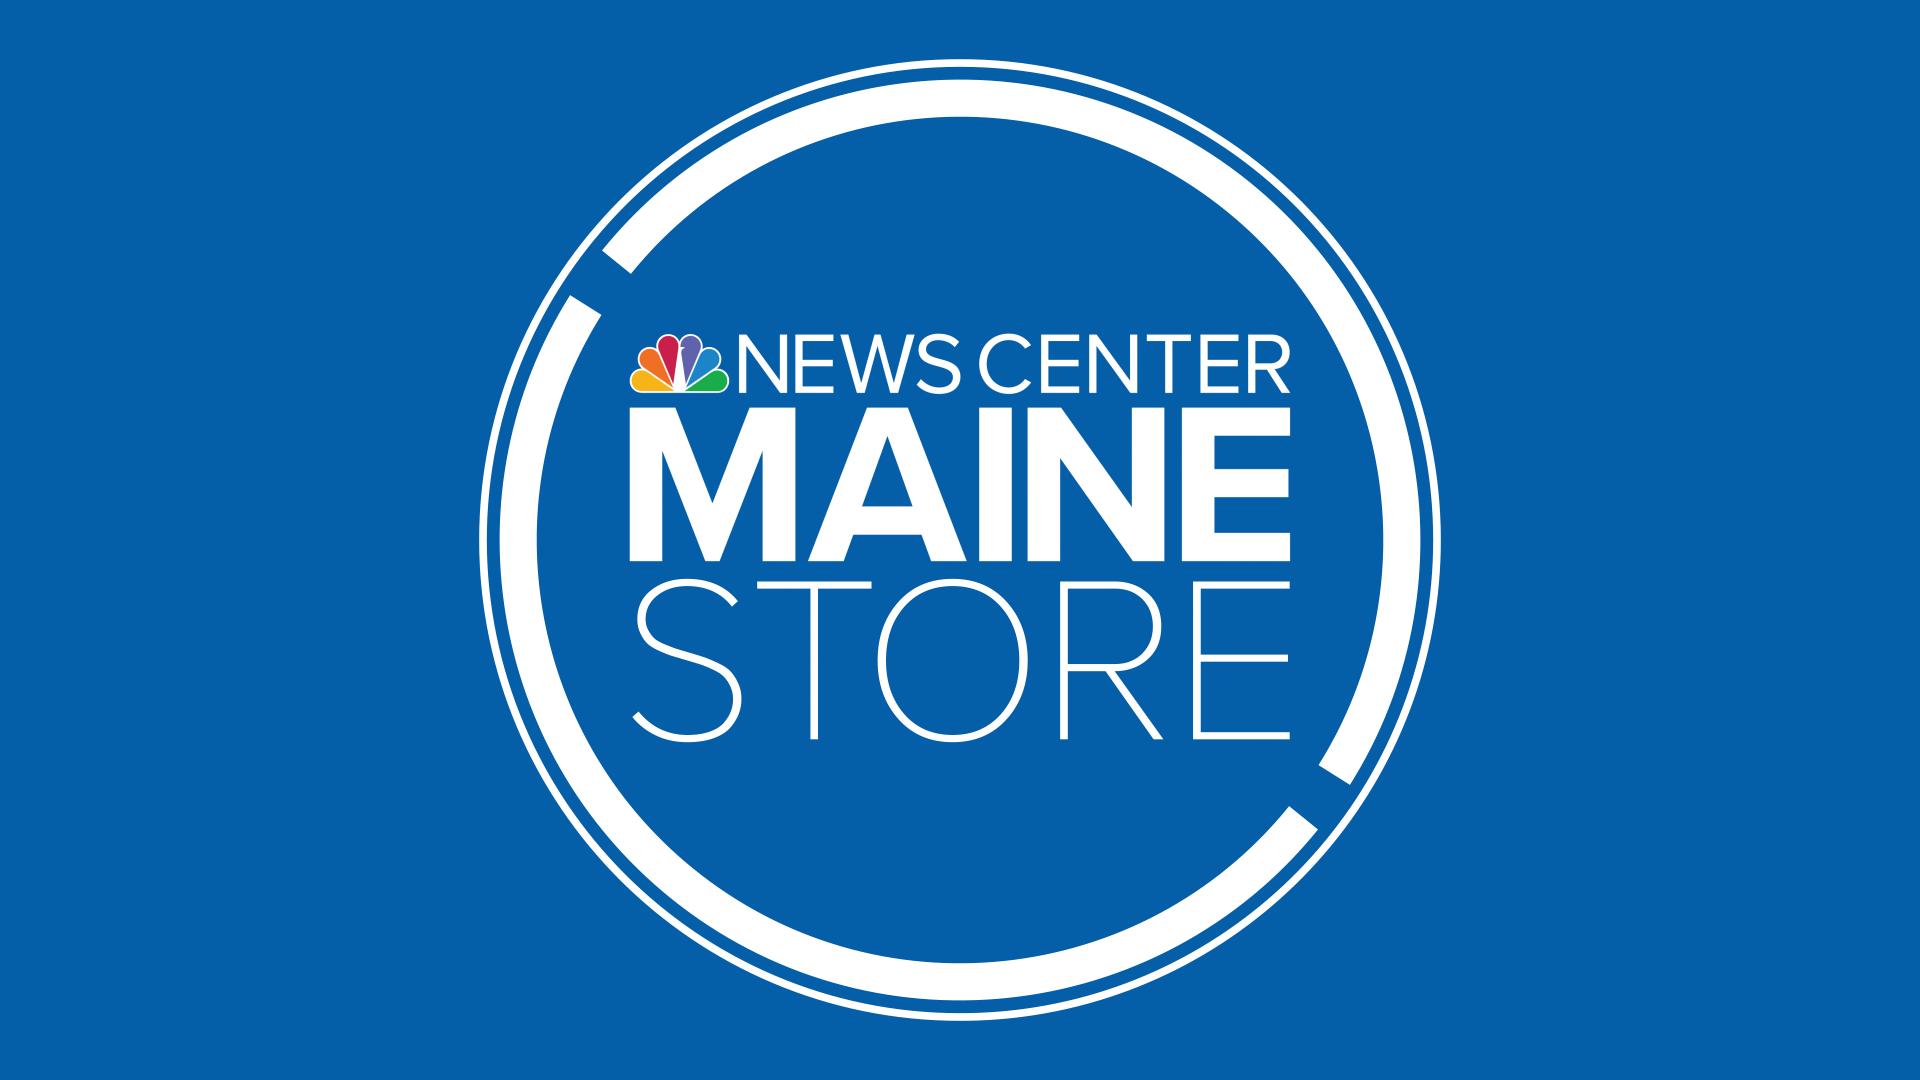 NEWS CENTER Maine Store